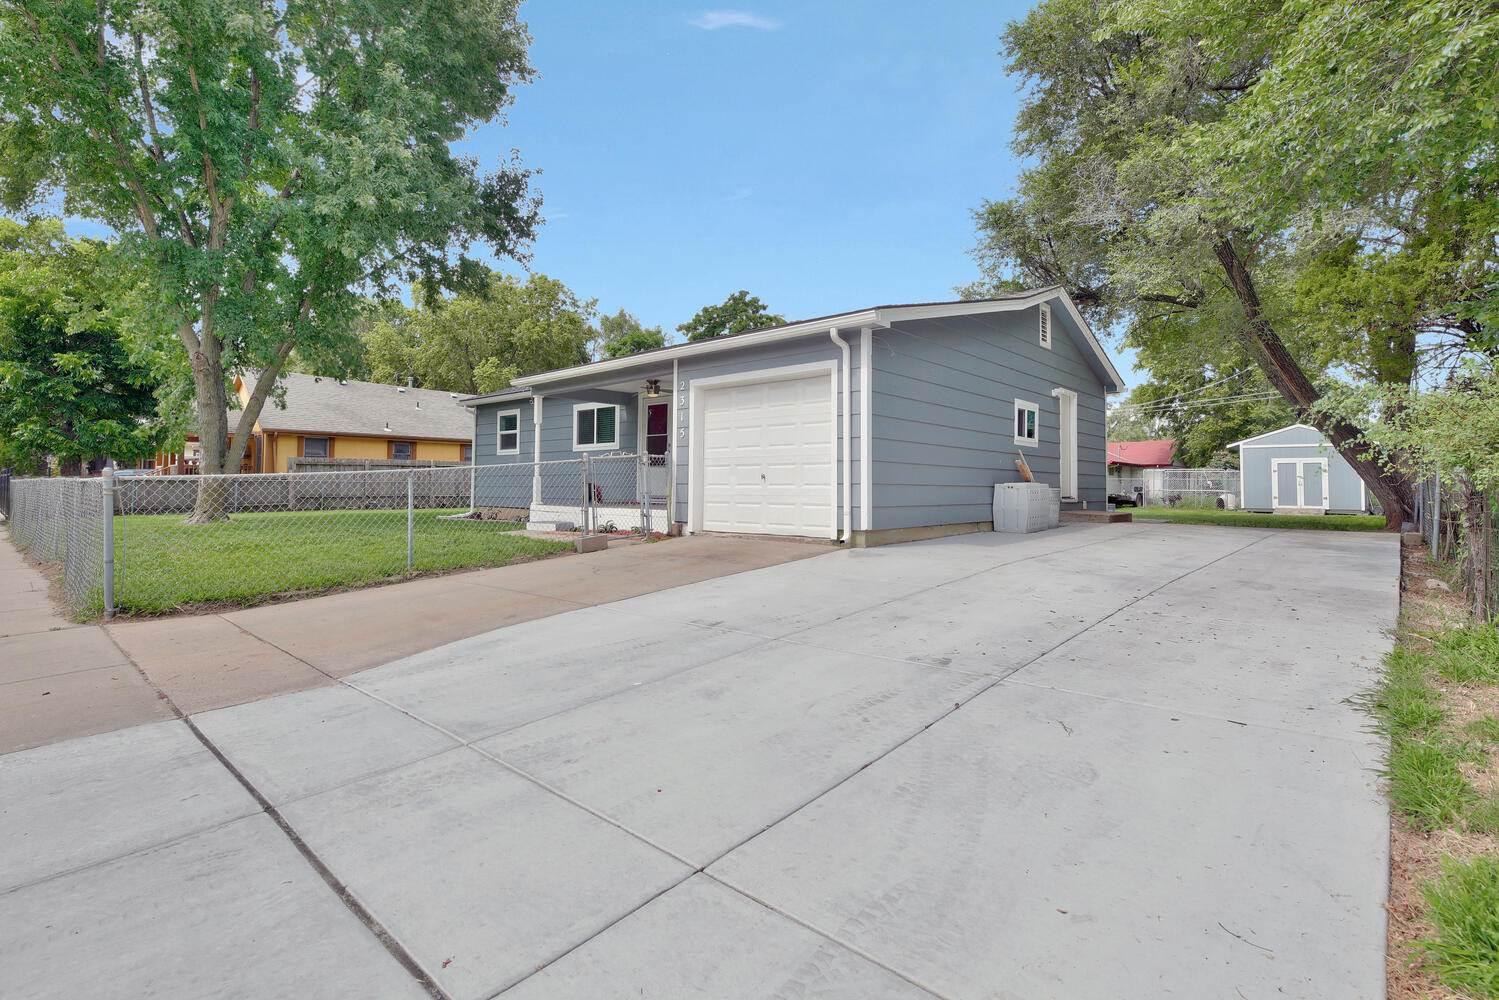 2315 N Woodland St, Wichita, KS 67204